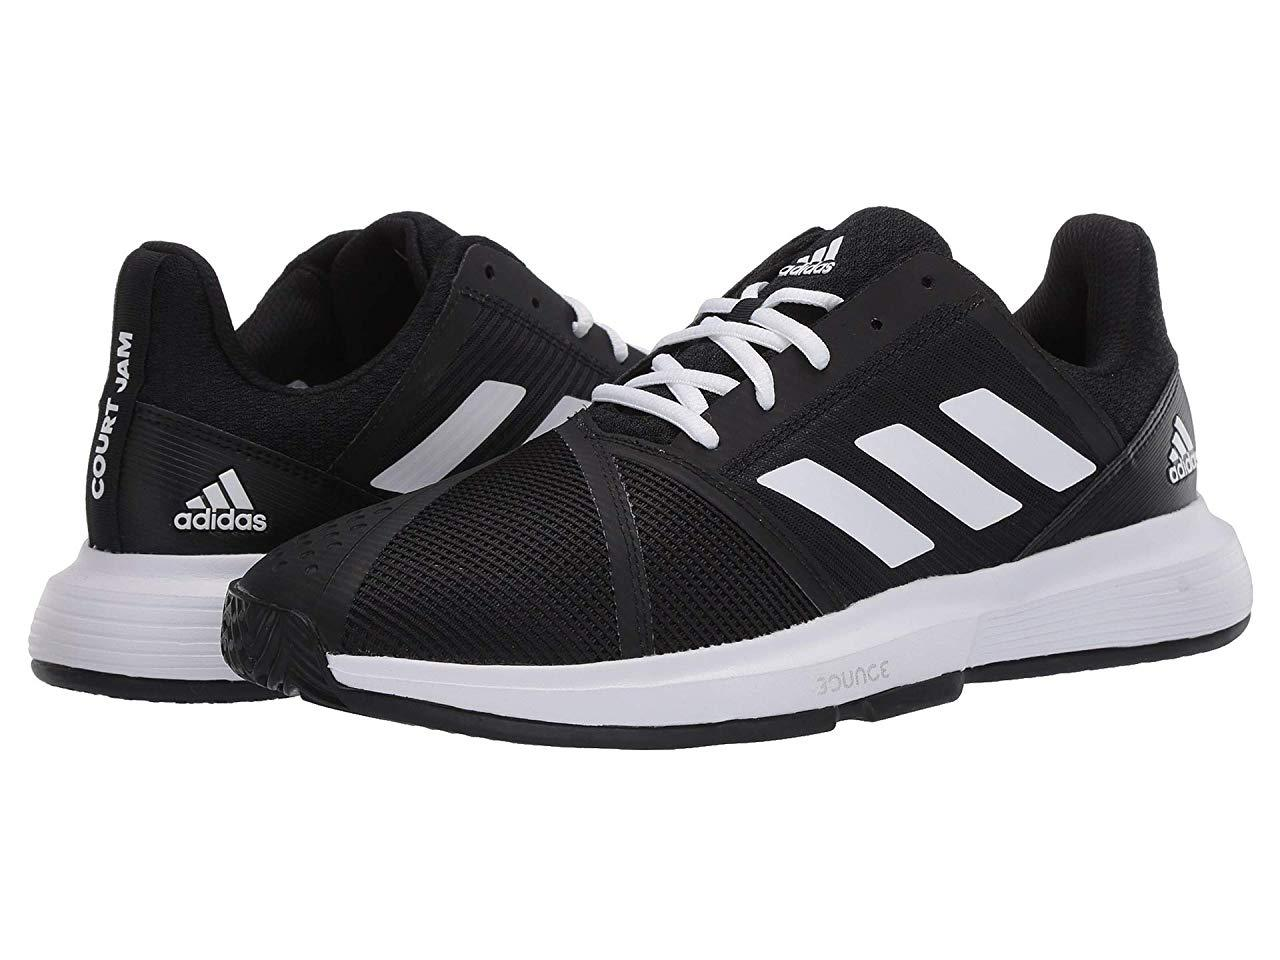 Кроссовки/Кеды adidas CourtJam Bounce Core Black/Footwear White/Matte Silver